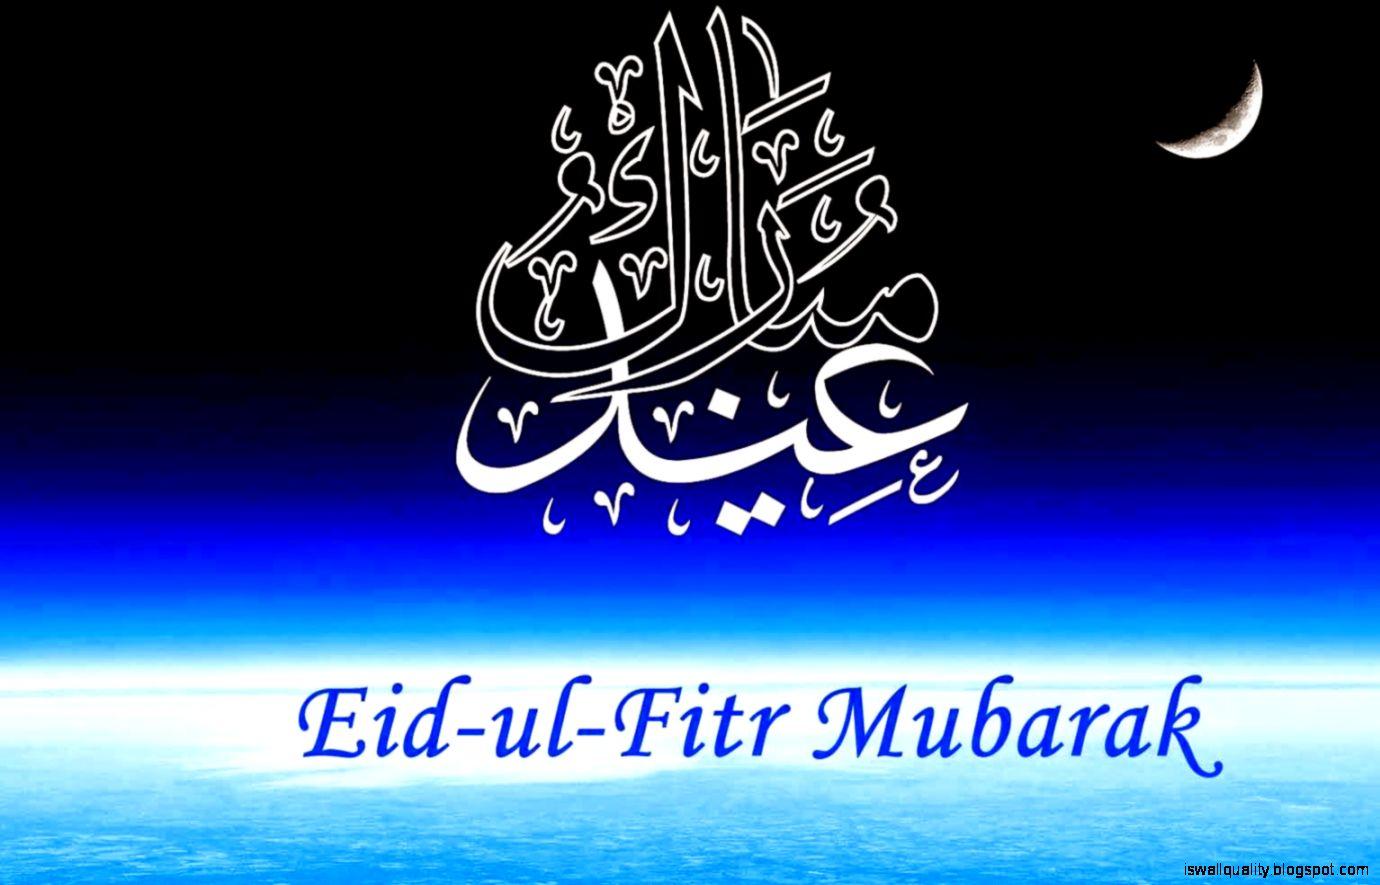 3d Eid Mubarak Hd Wallpaper Wallpapers Quality